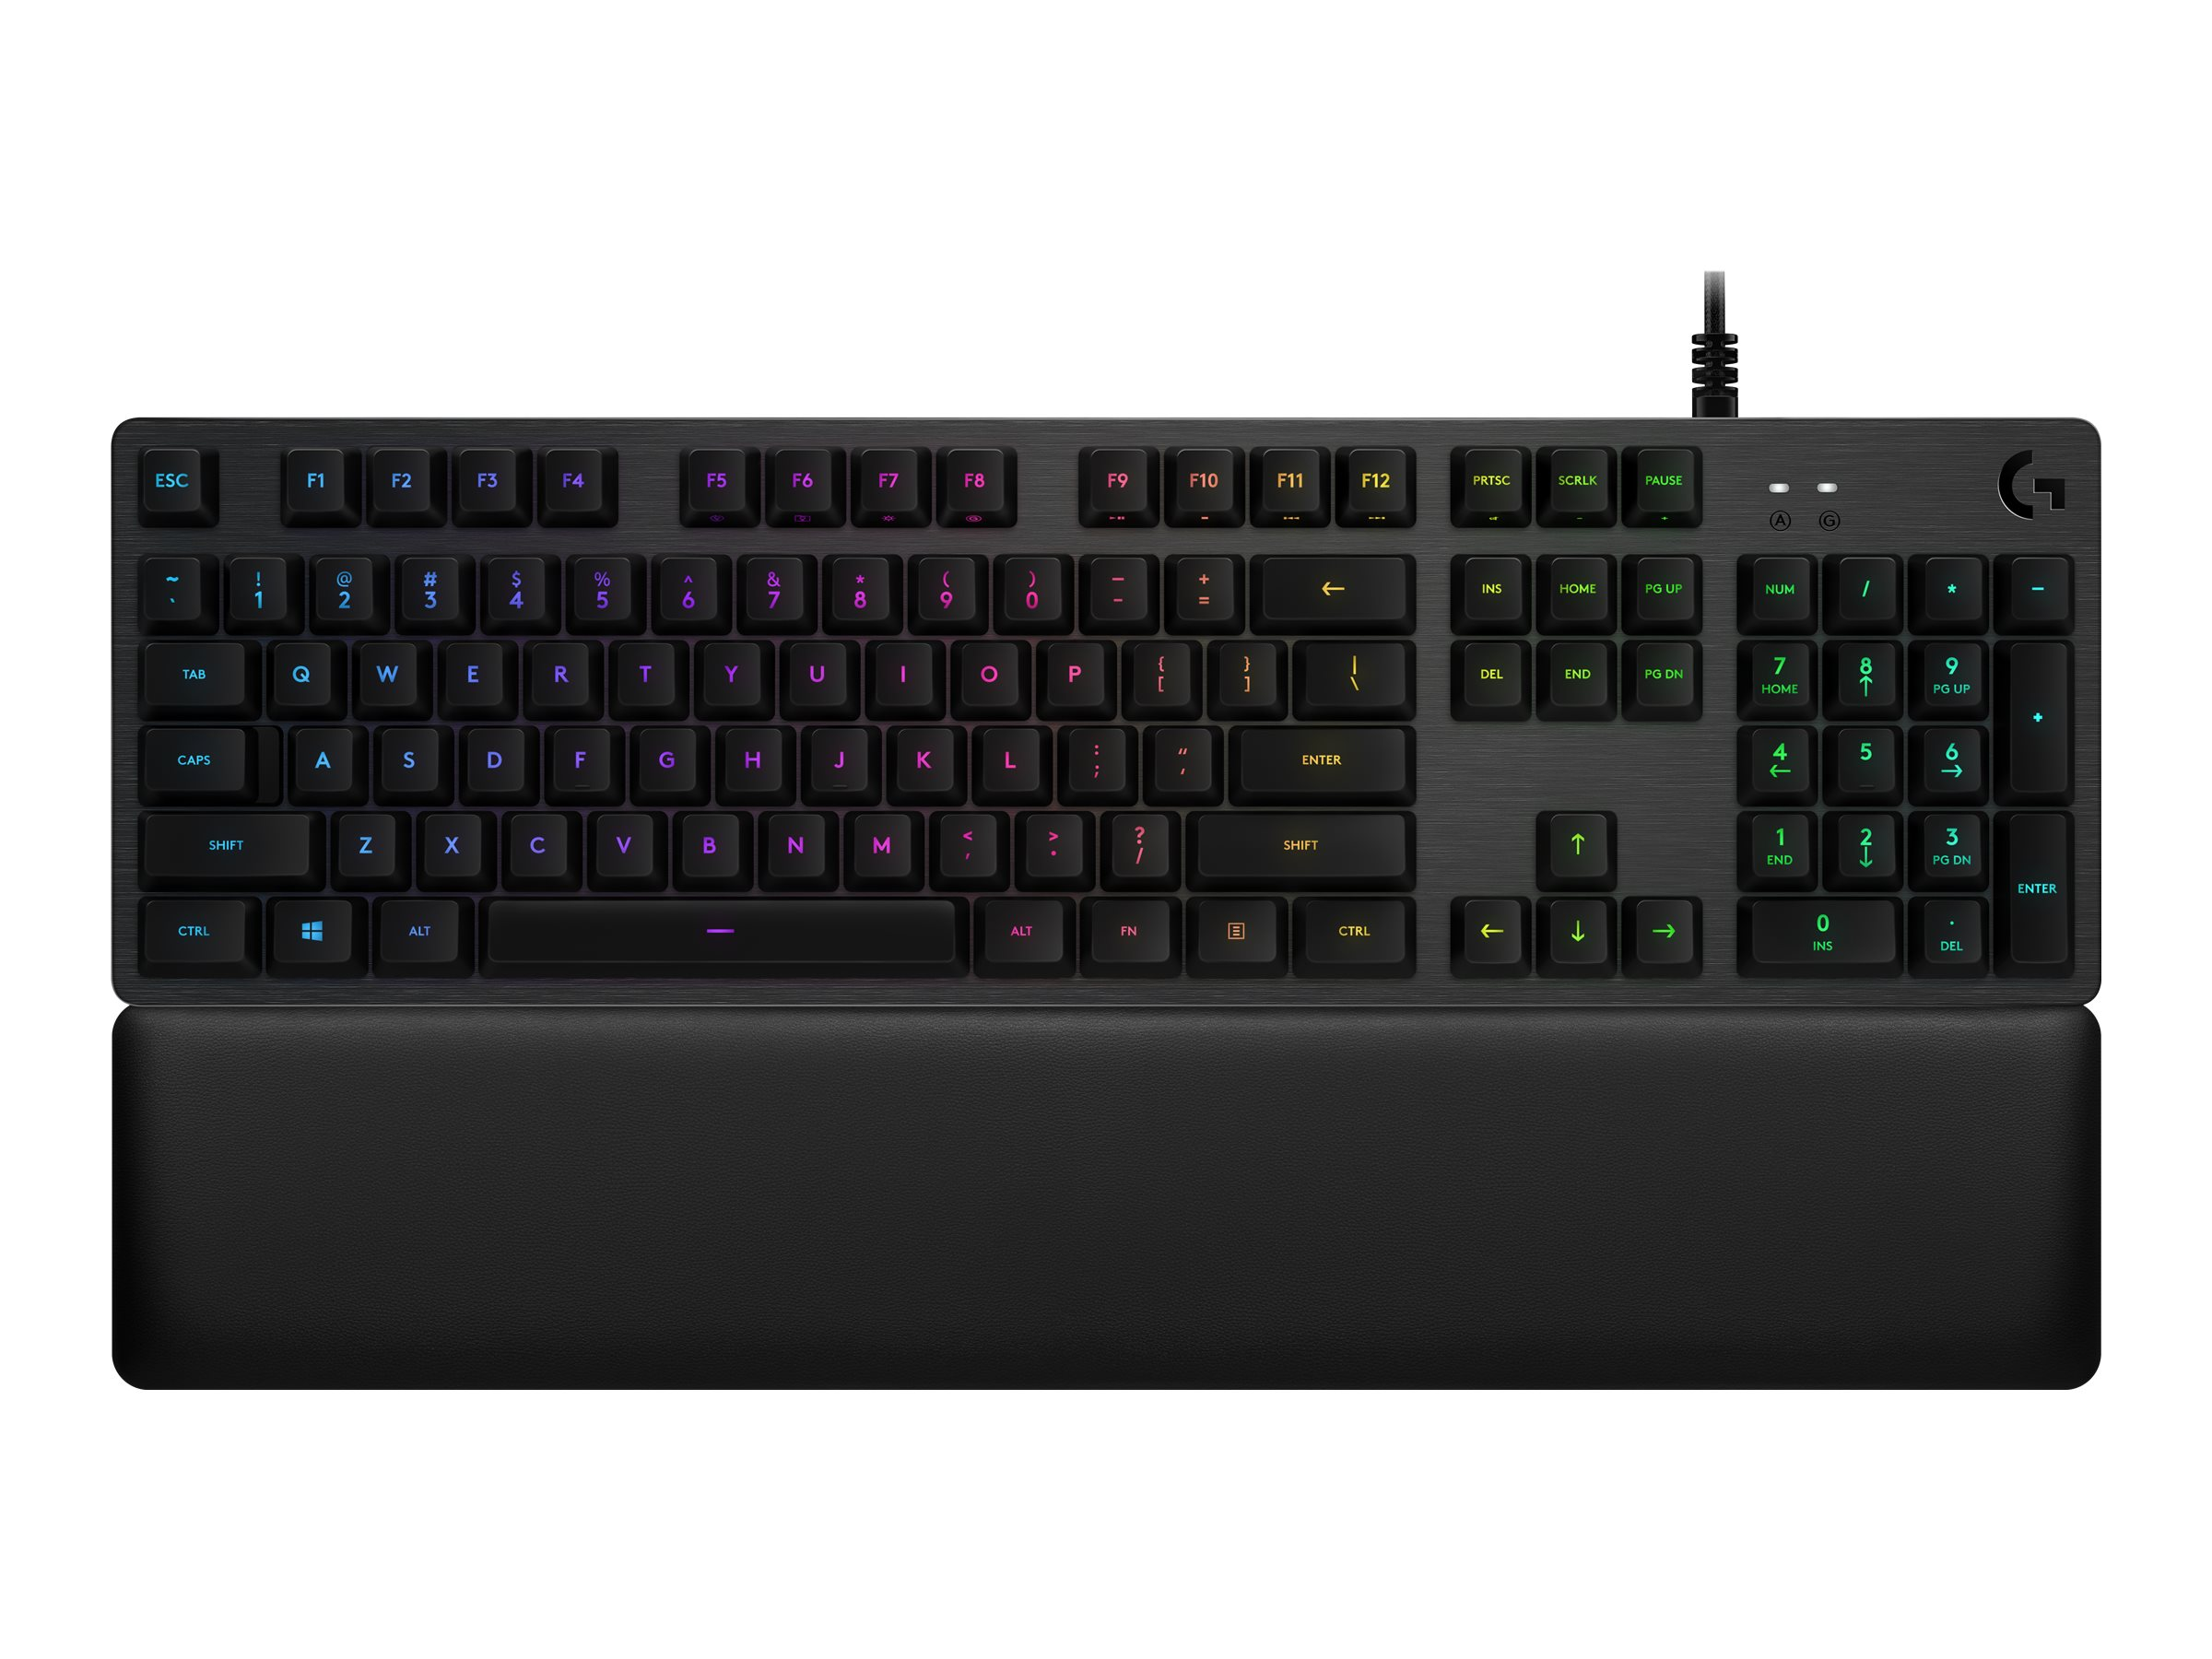 Logitech Gaming G513 - Tastatur - Hintergrundbeleuchtung - USB - Schweizer - Schlüsselschalter: Romer-G Linear